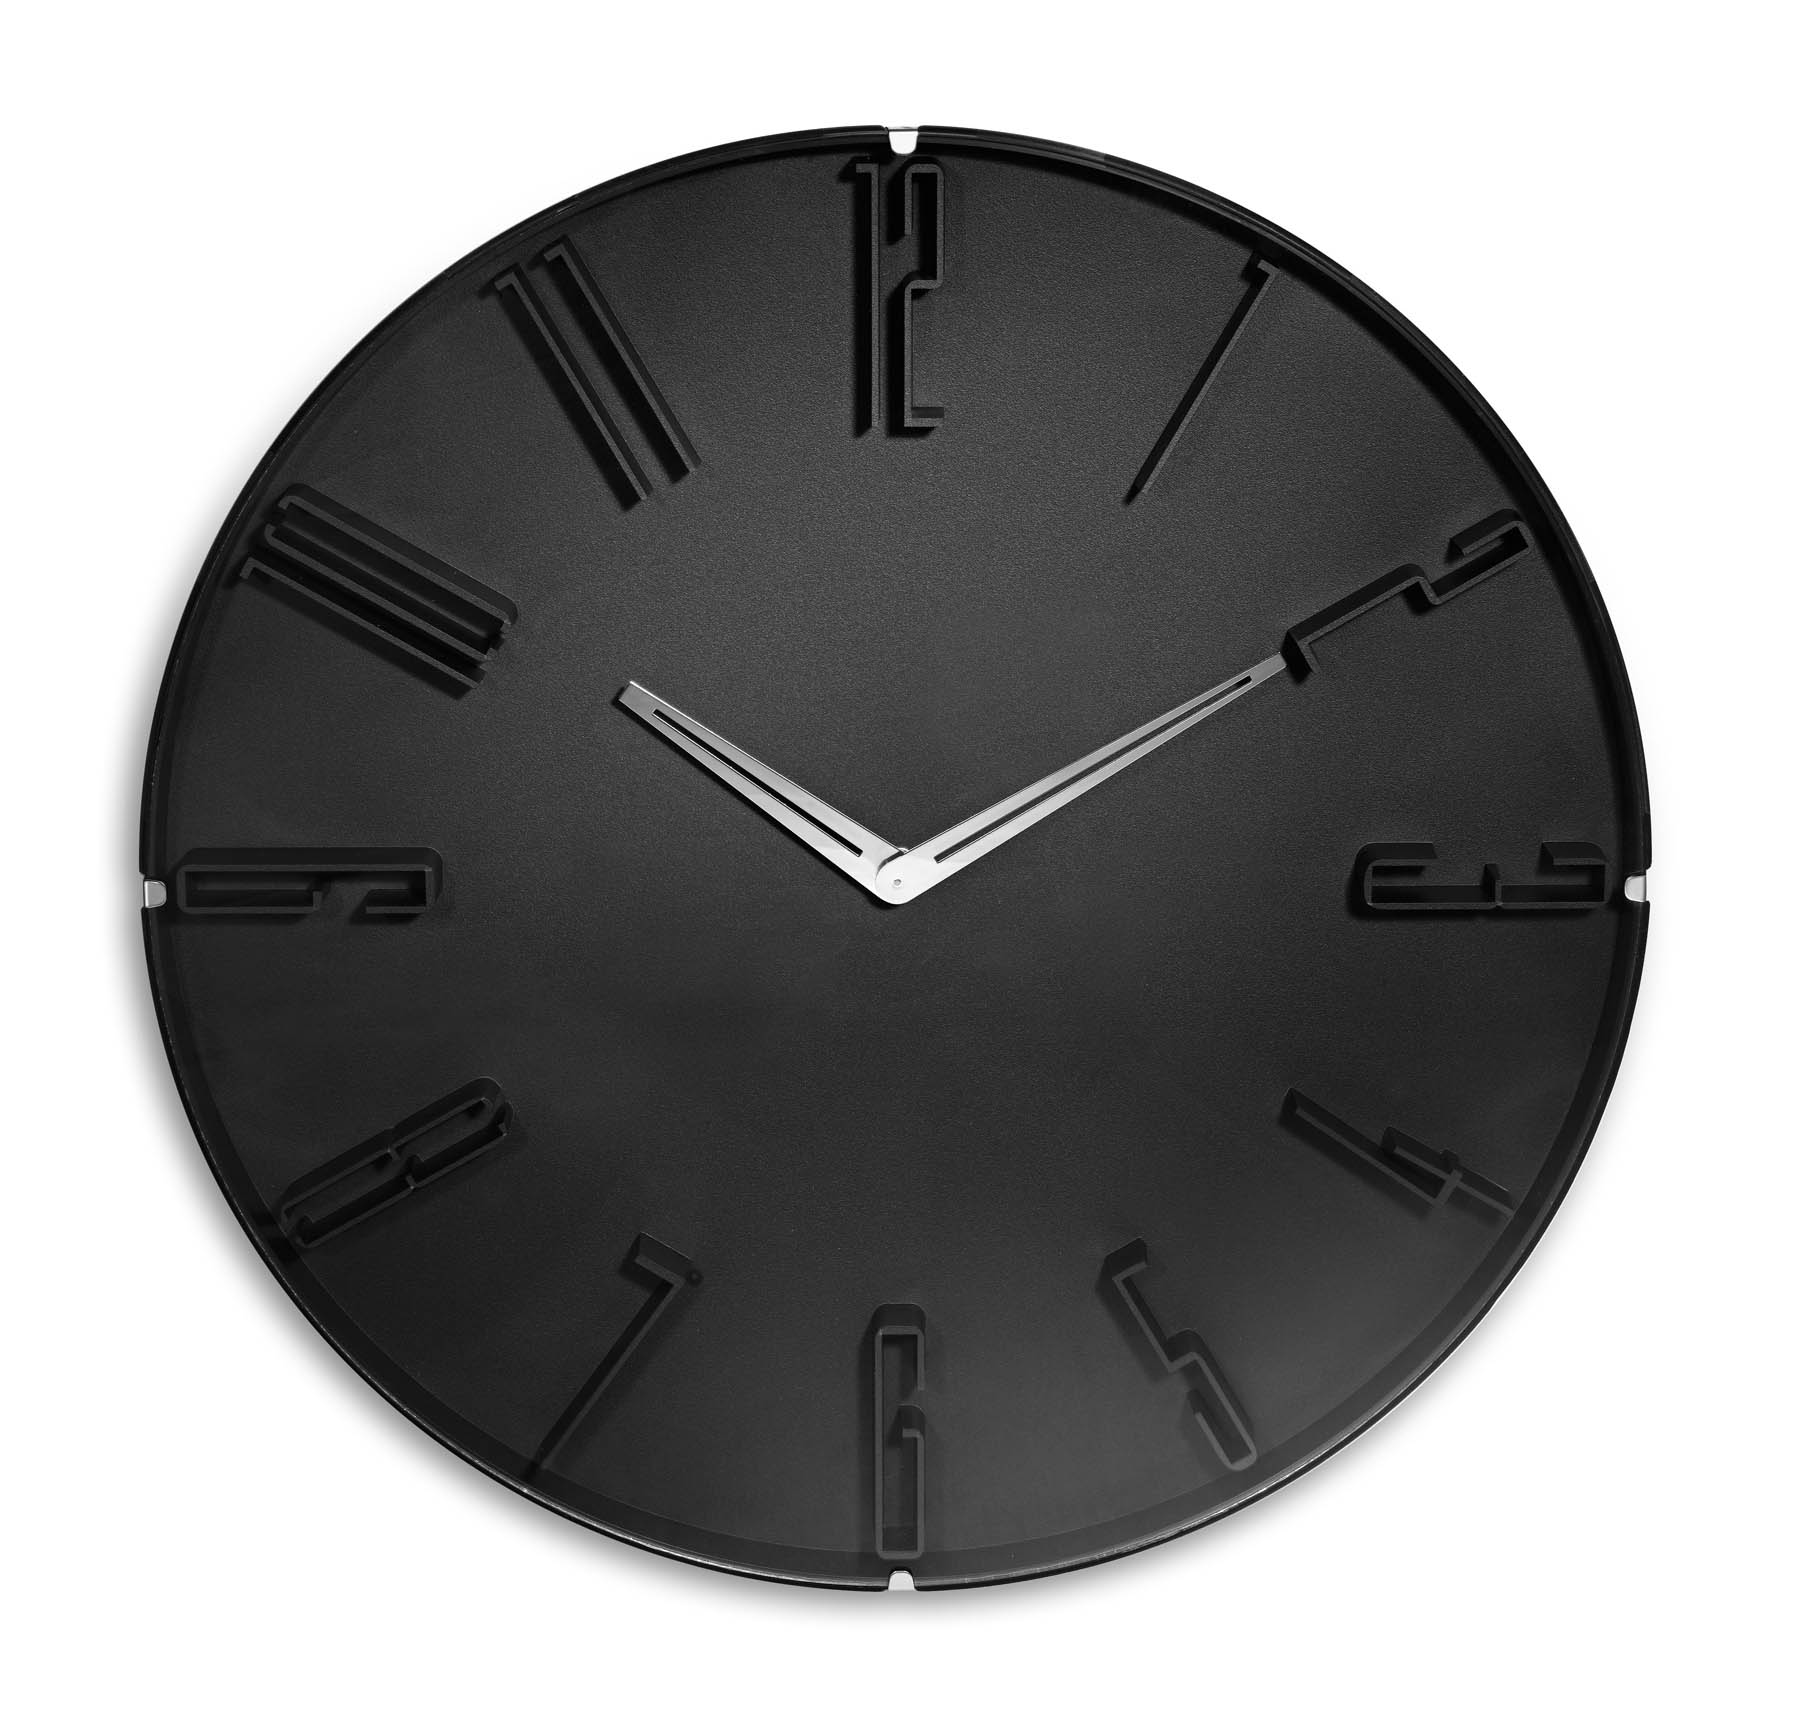 Horloge Salle De Bain Design | Revger Horloge Xxl Design Idée ...